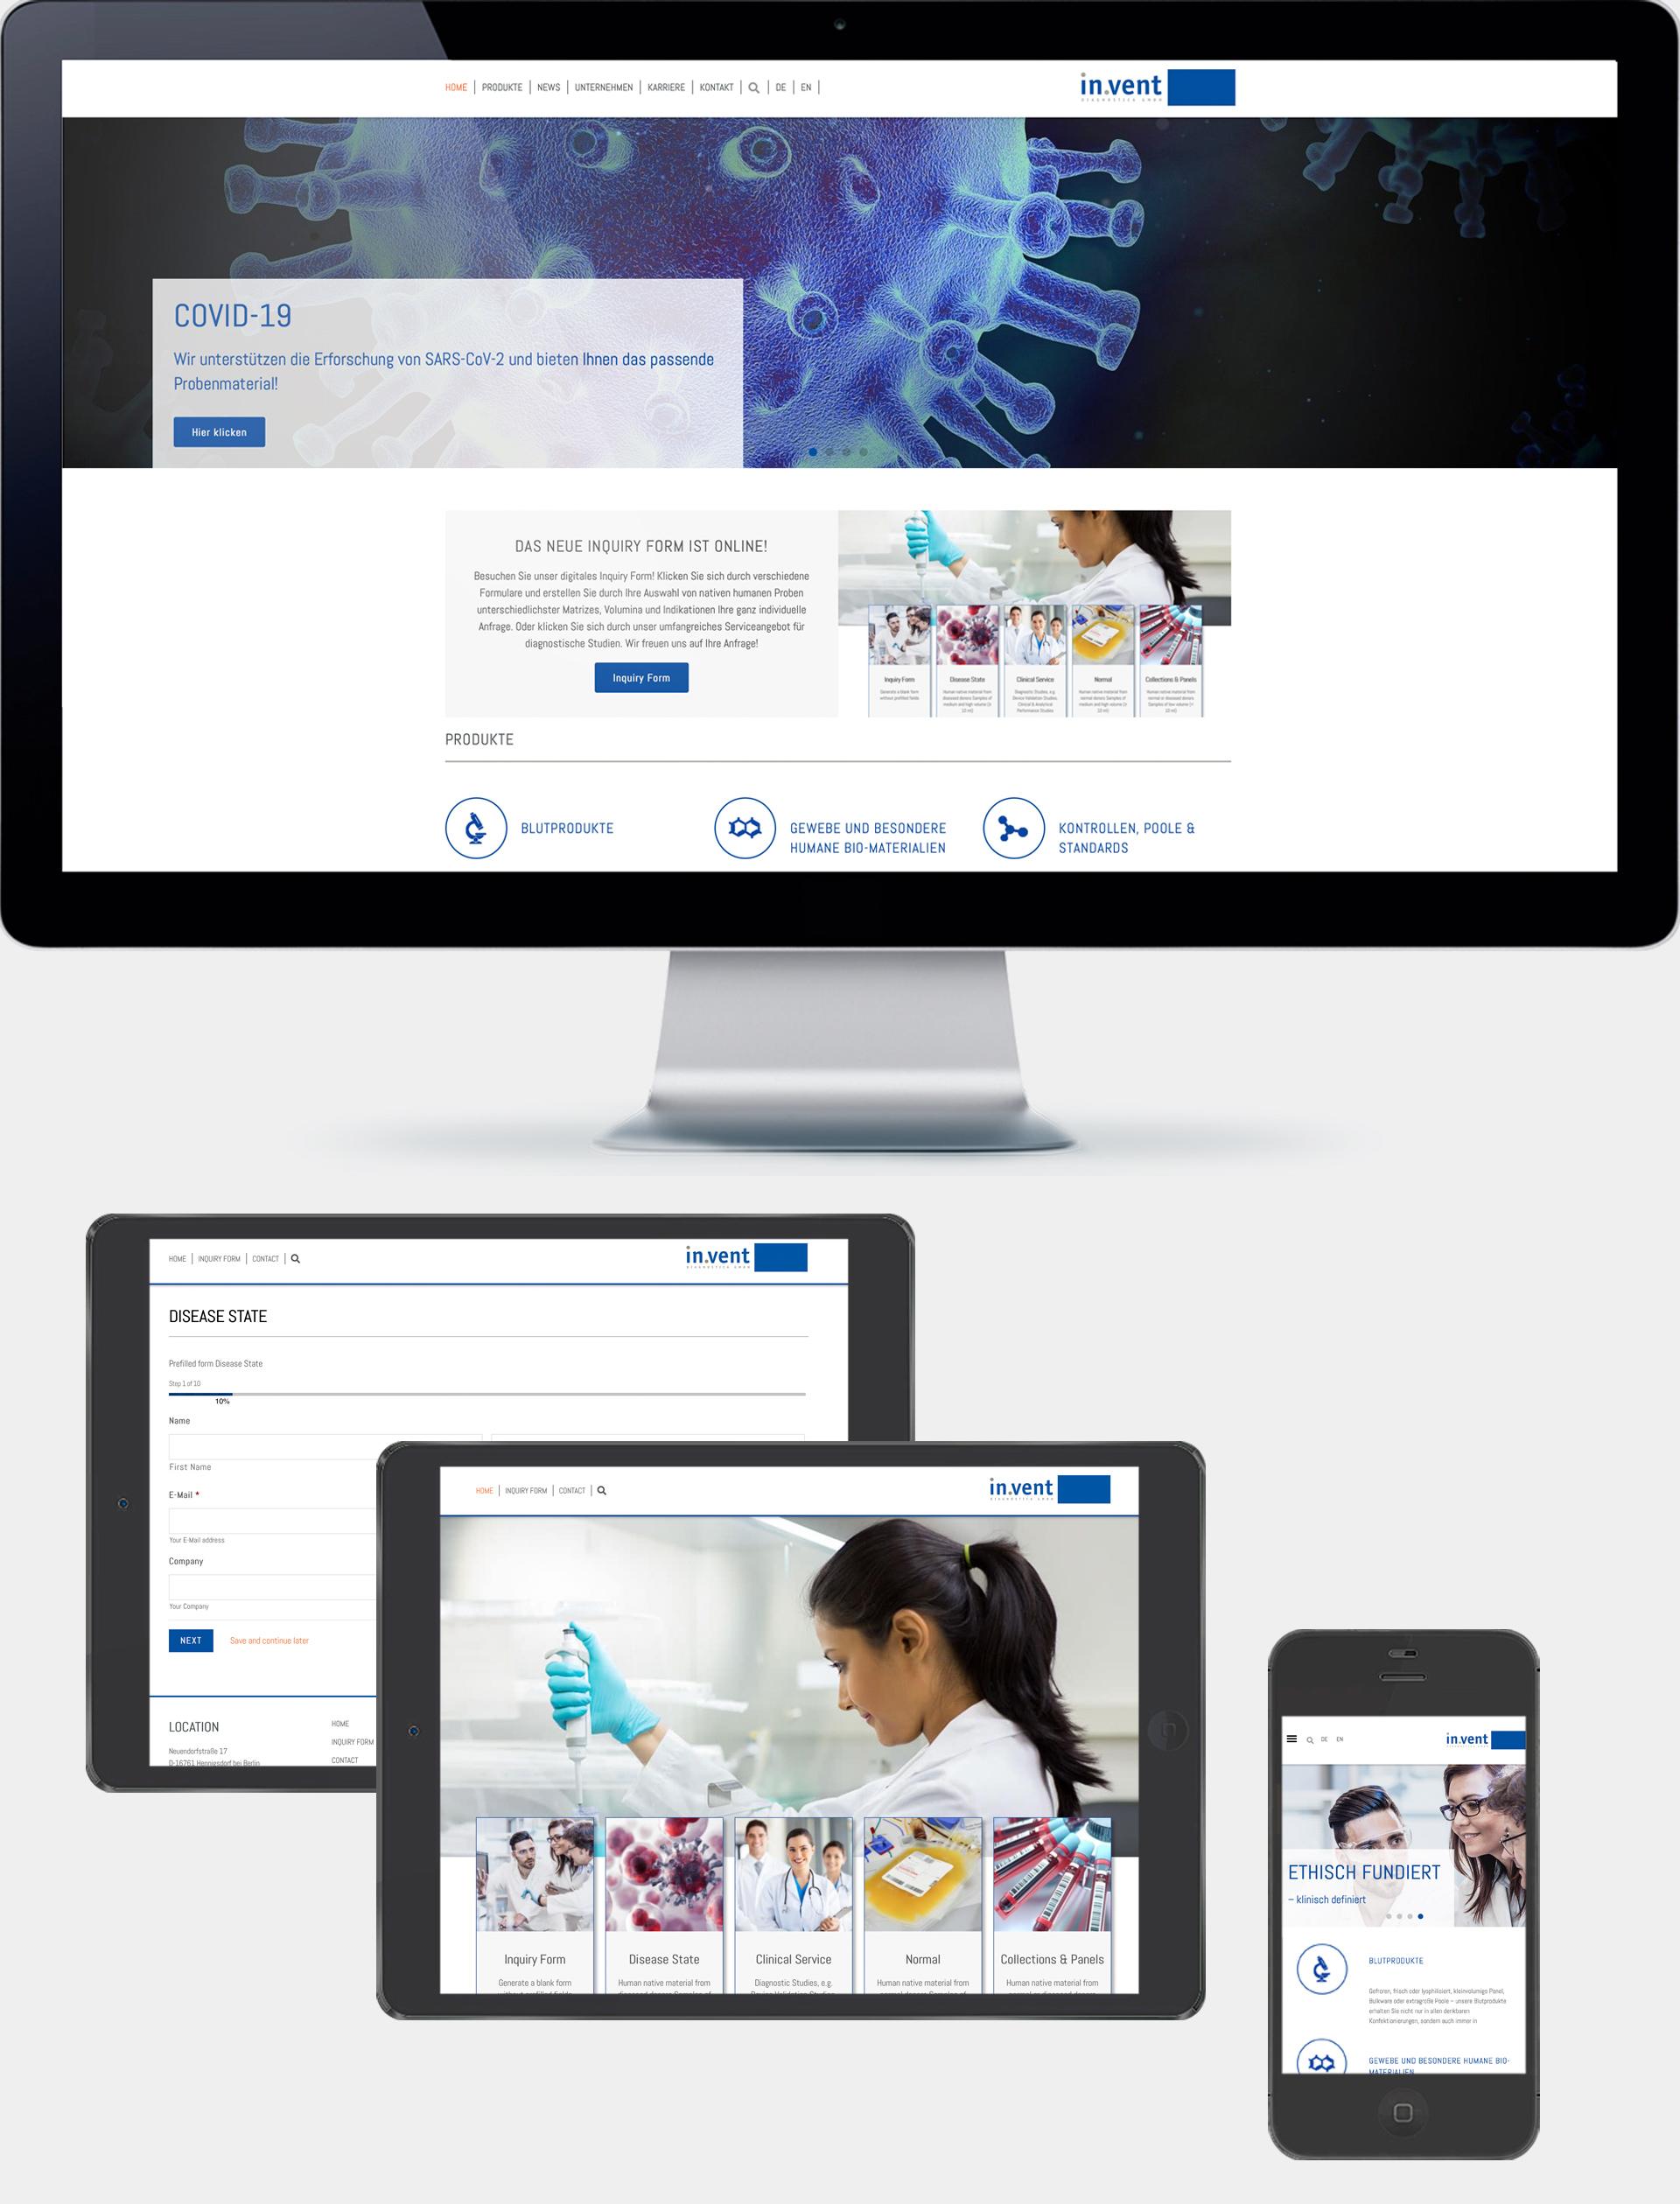 Referenz agreement - Website in.vent Diagnostica